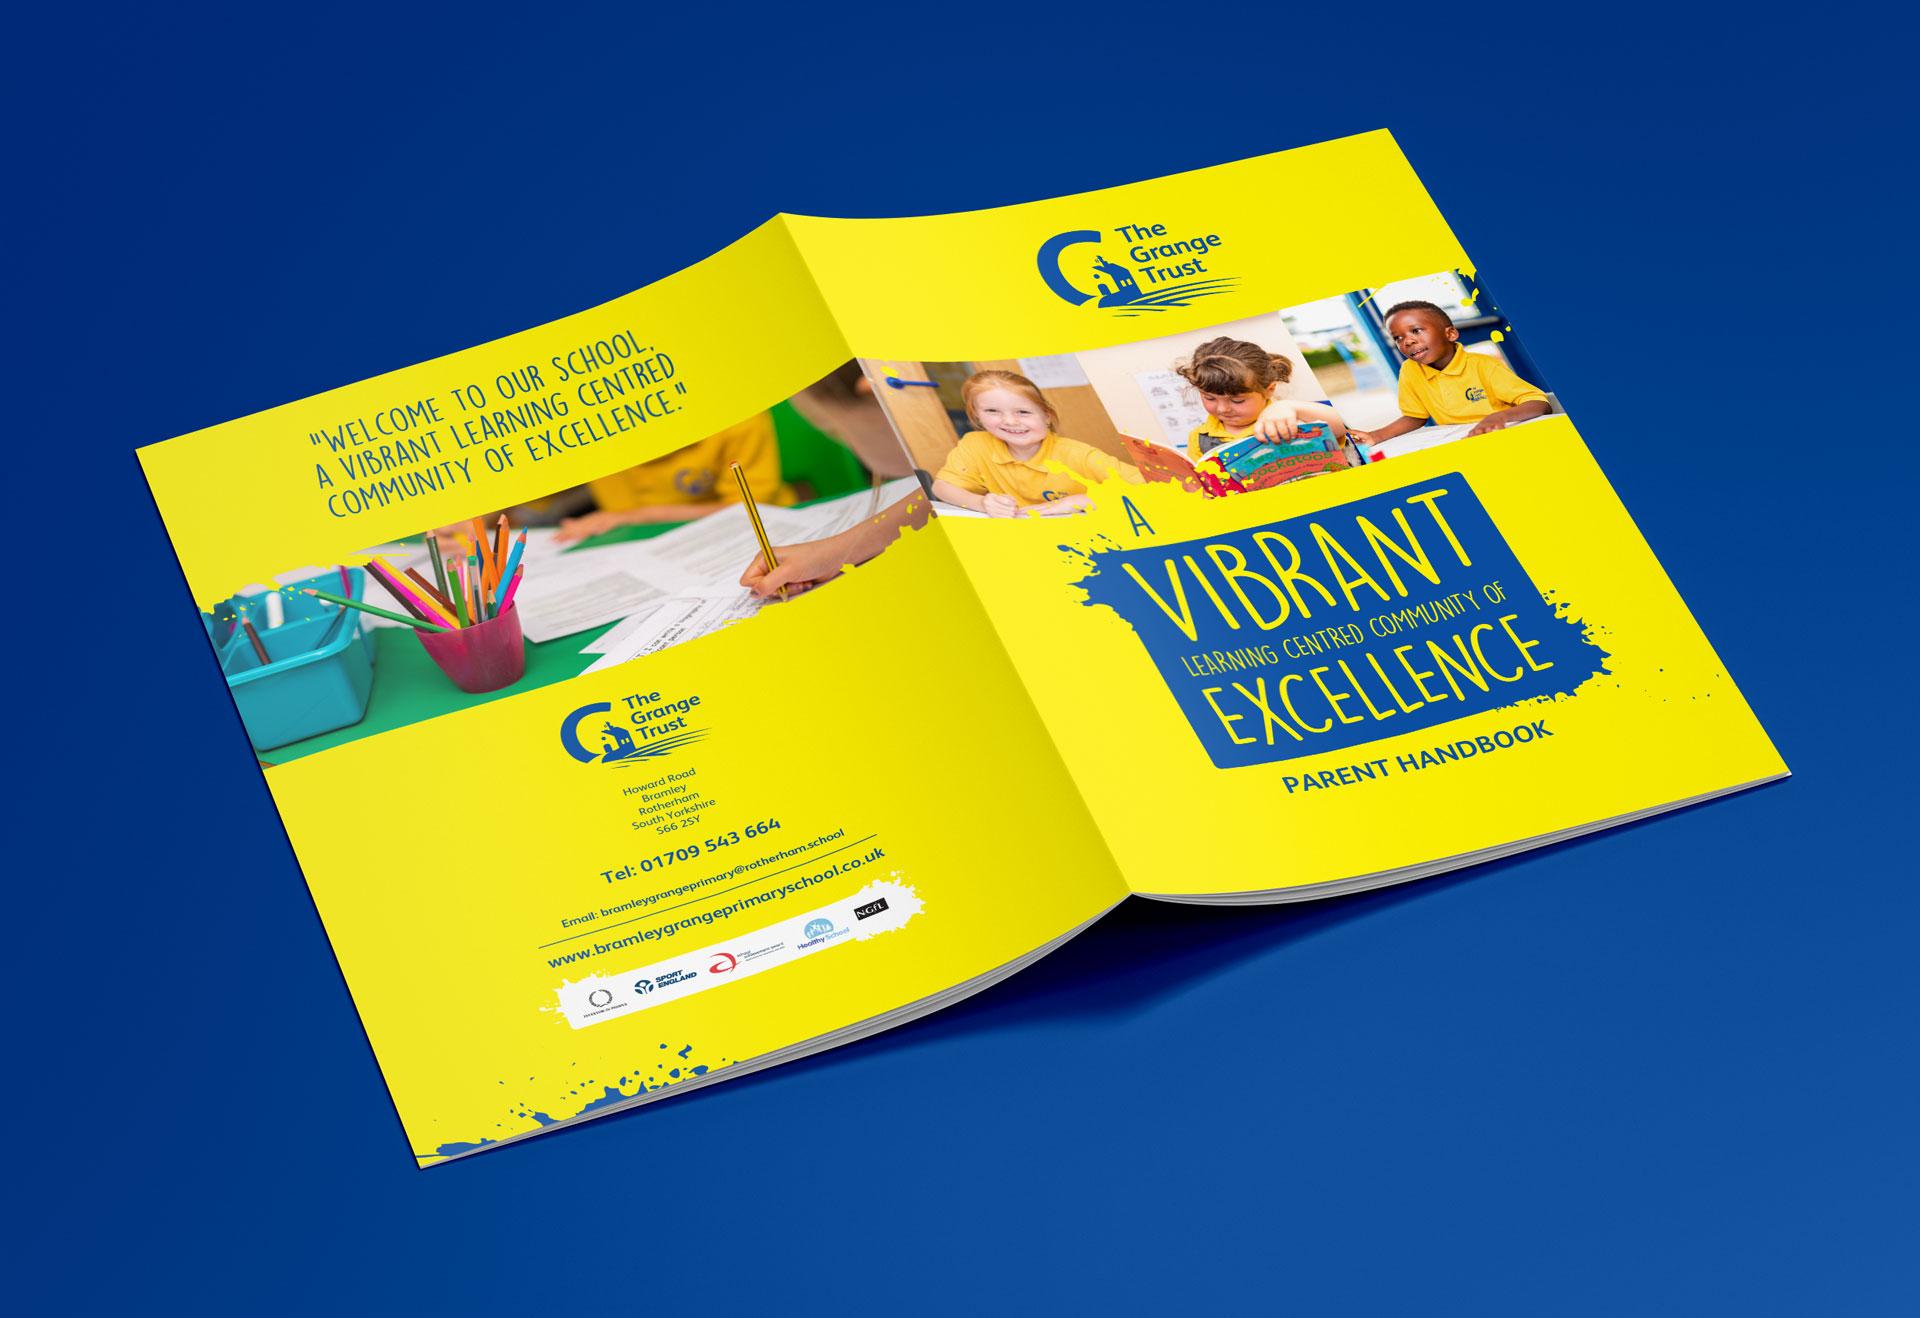 Idea Creative Design Studio Graphic Design Digital Design Website Design Photography Video Production South Yorkshire Rotherham Sheffield Manchester The Grange Trust Parent Handbook